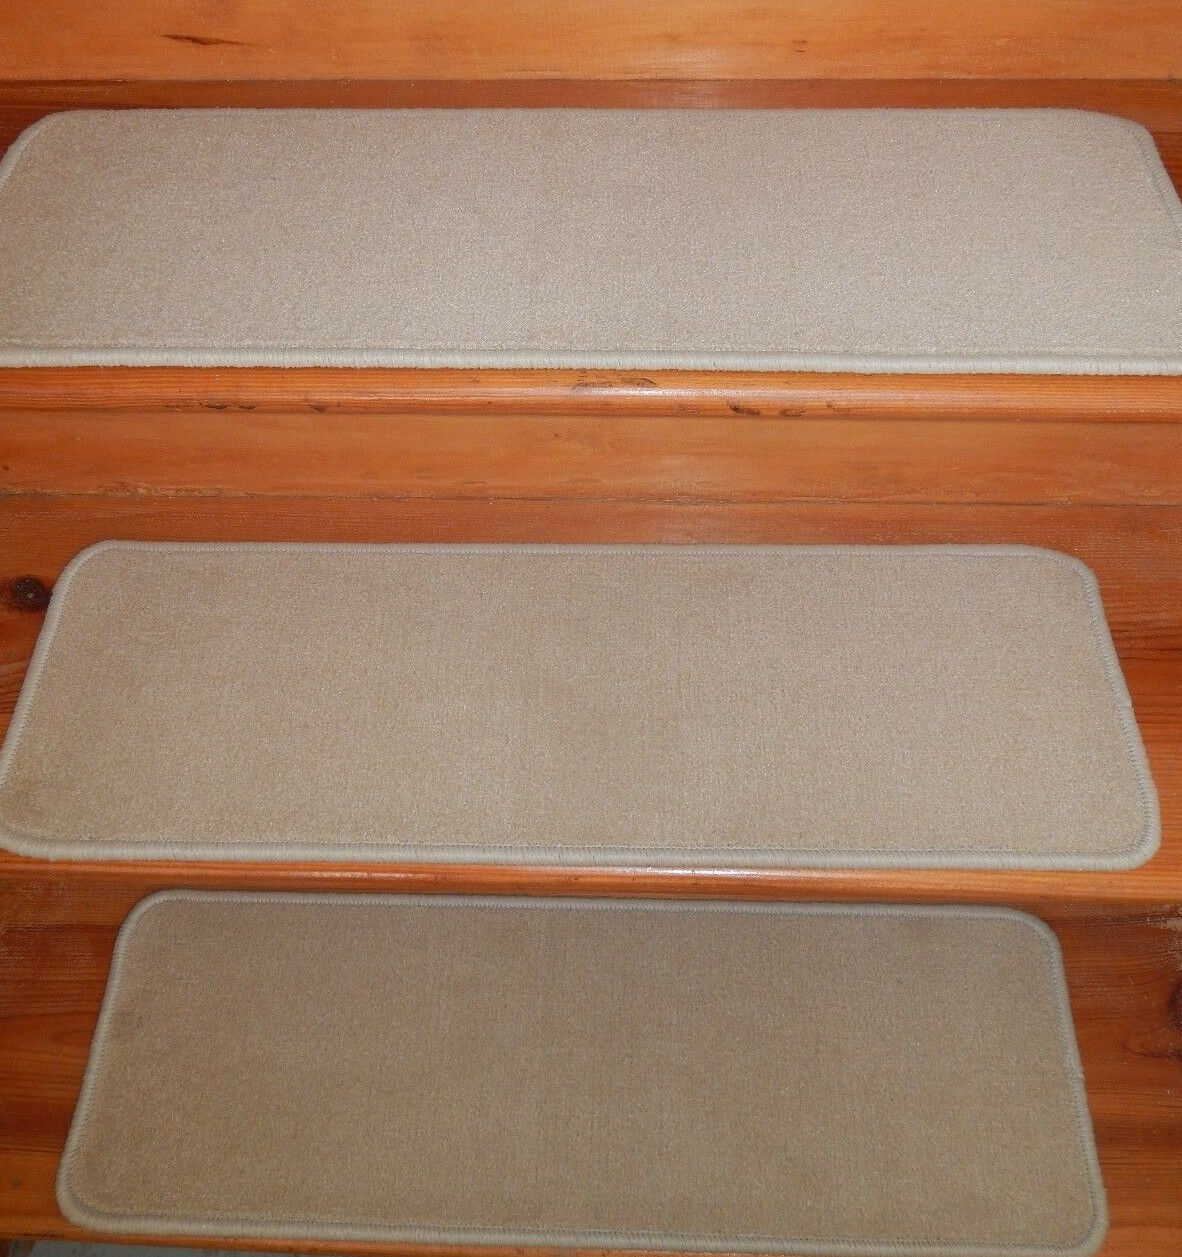 13 Step = 9'' x 28'' + 1 Landing 27'' x 28'' Stair Treads Wool Blend carpet  .